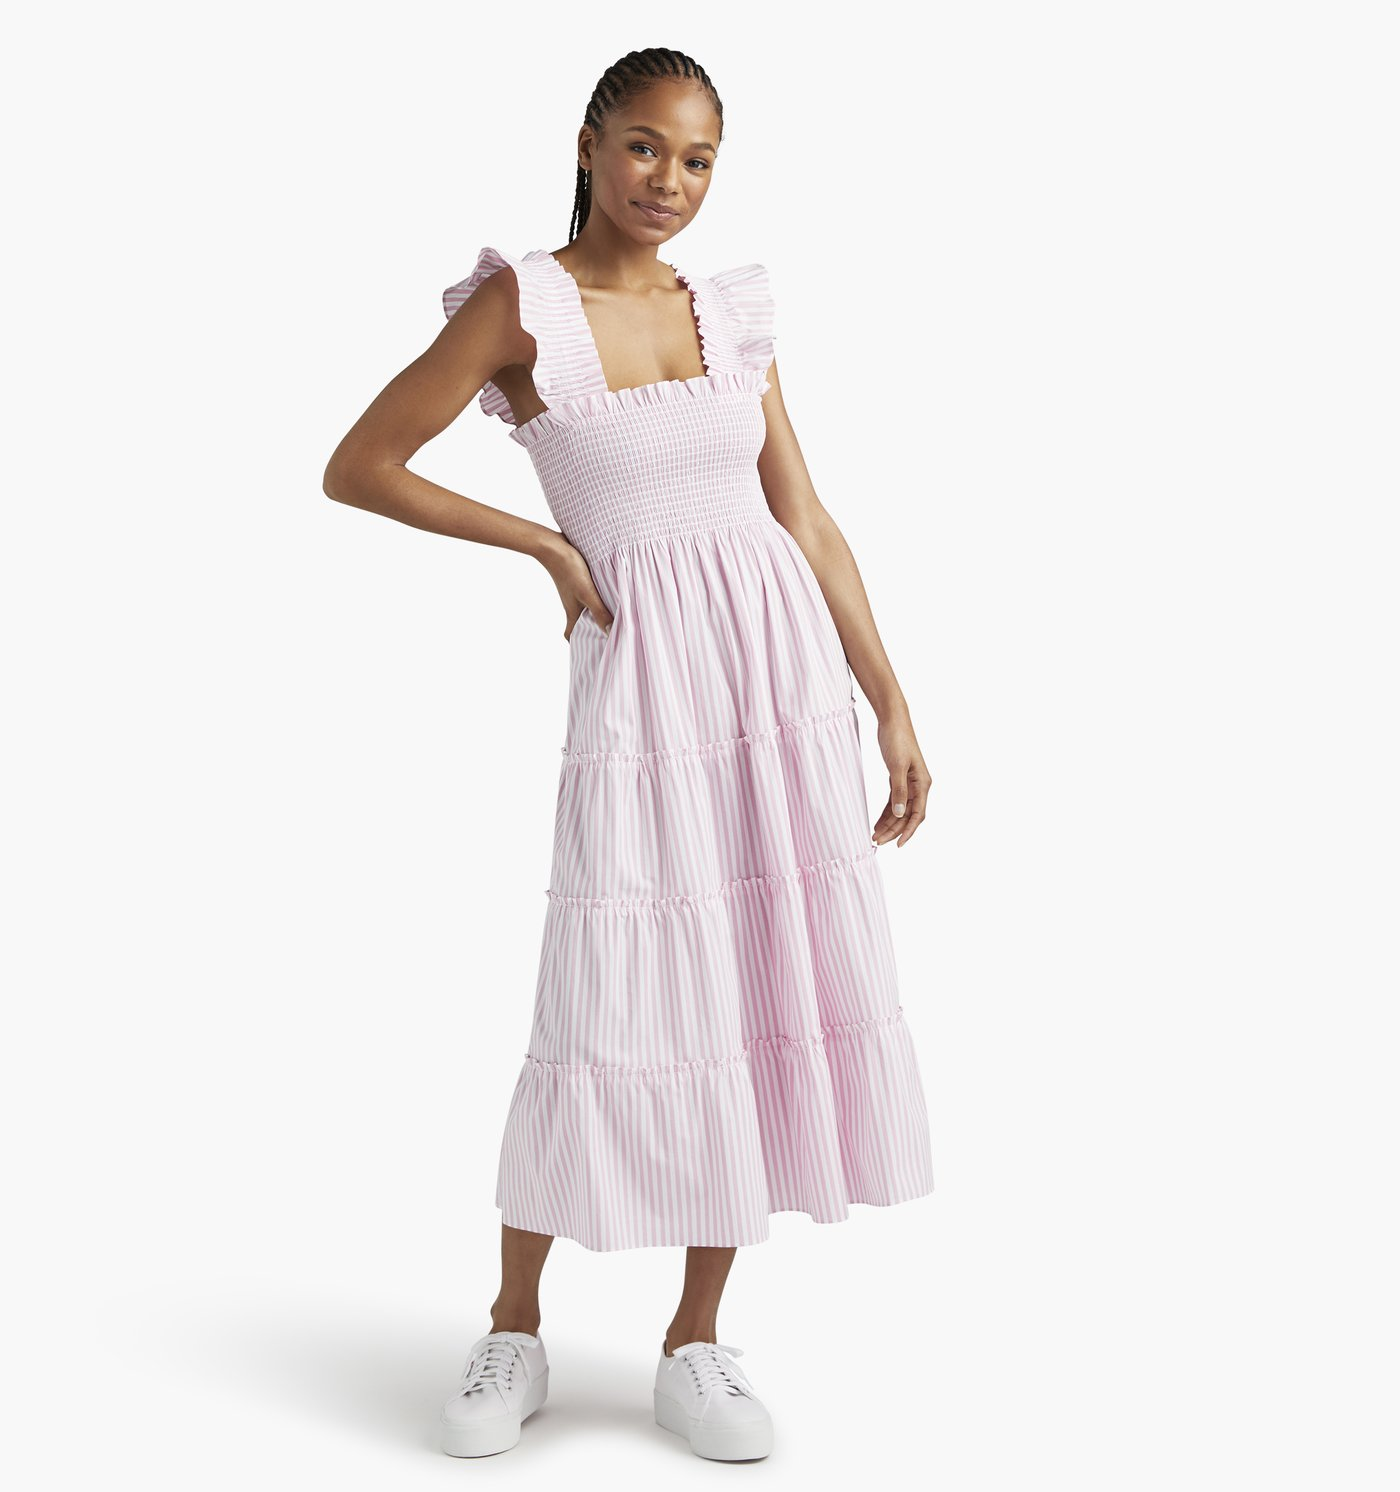 ellie nap dress new designs | Hill House New Arrivals for Women + Little Girls